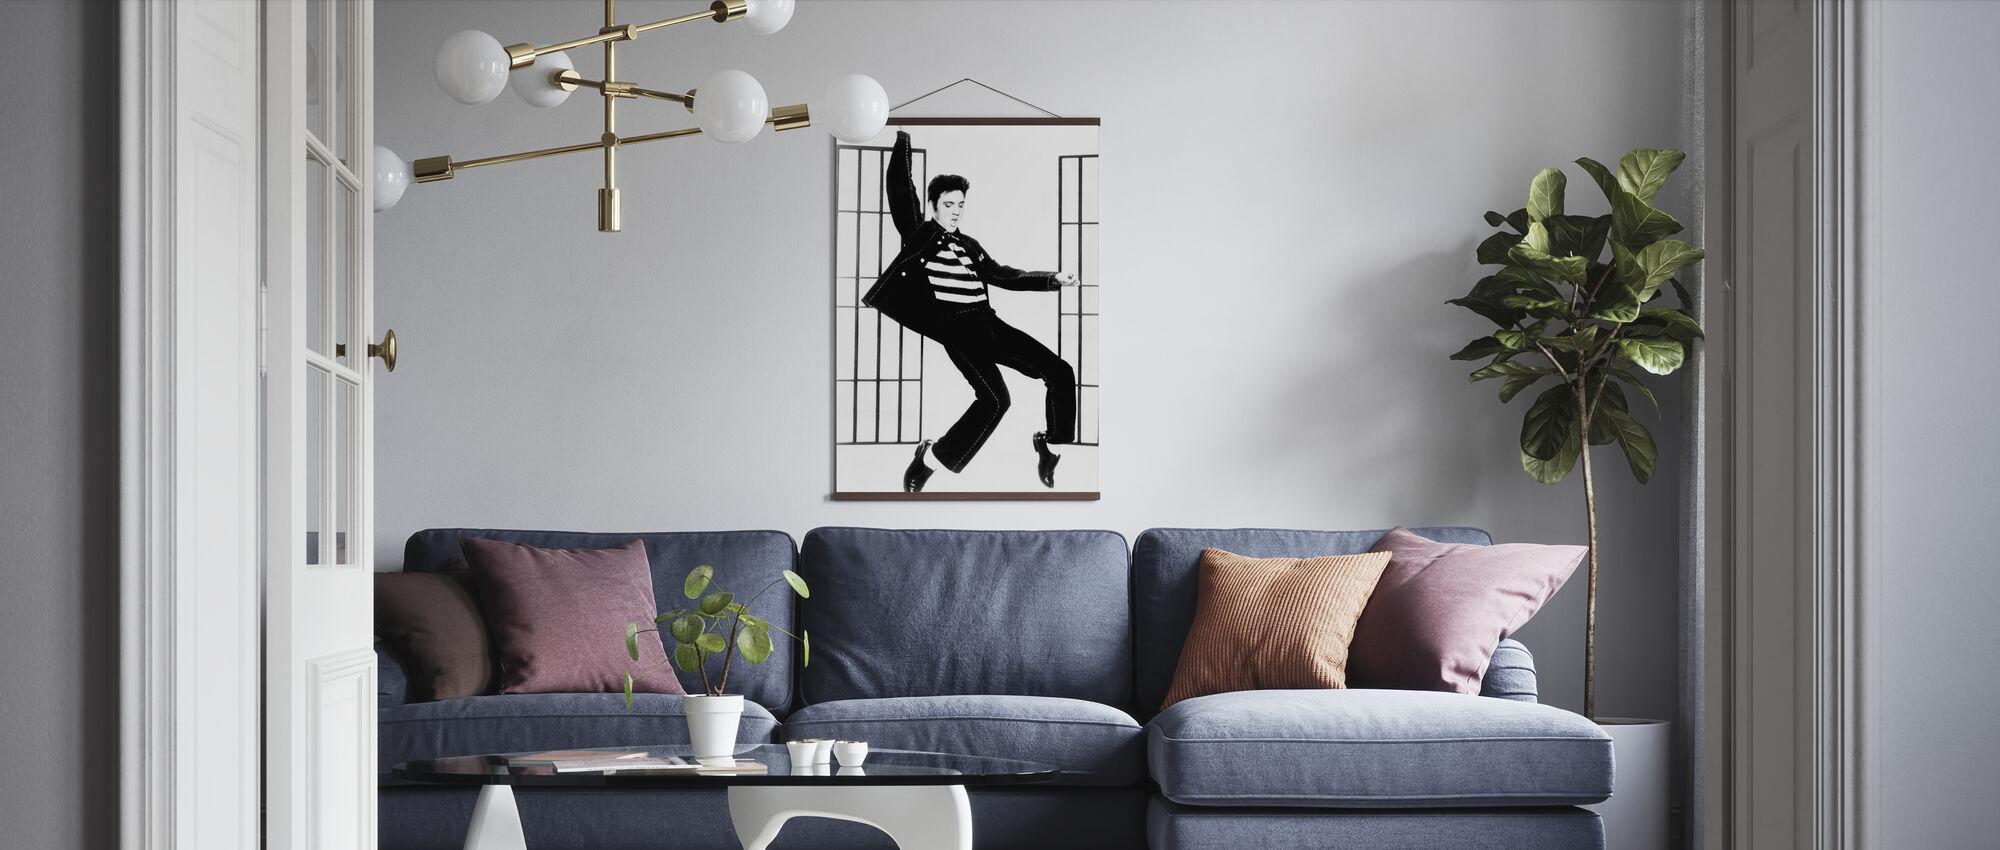 Jailhouse Rock - Poster - Living Room